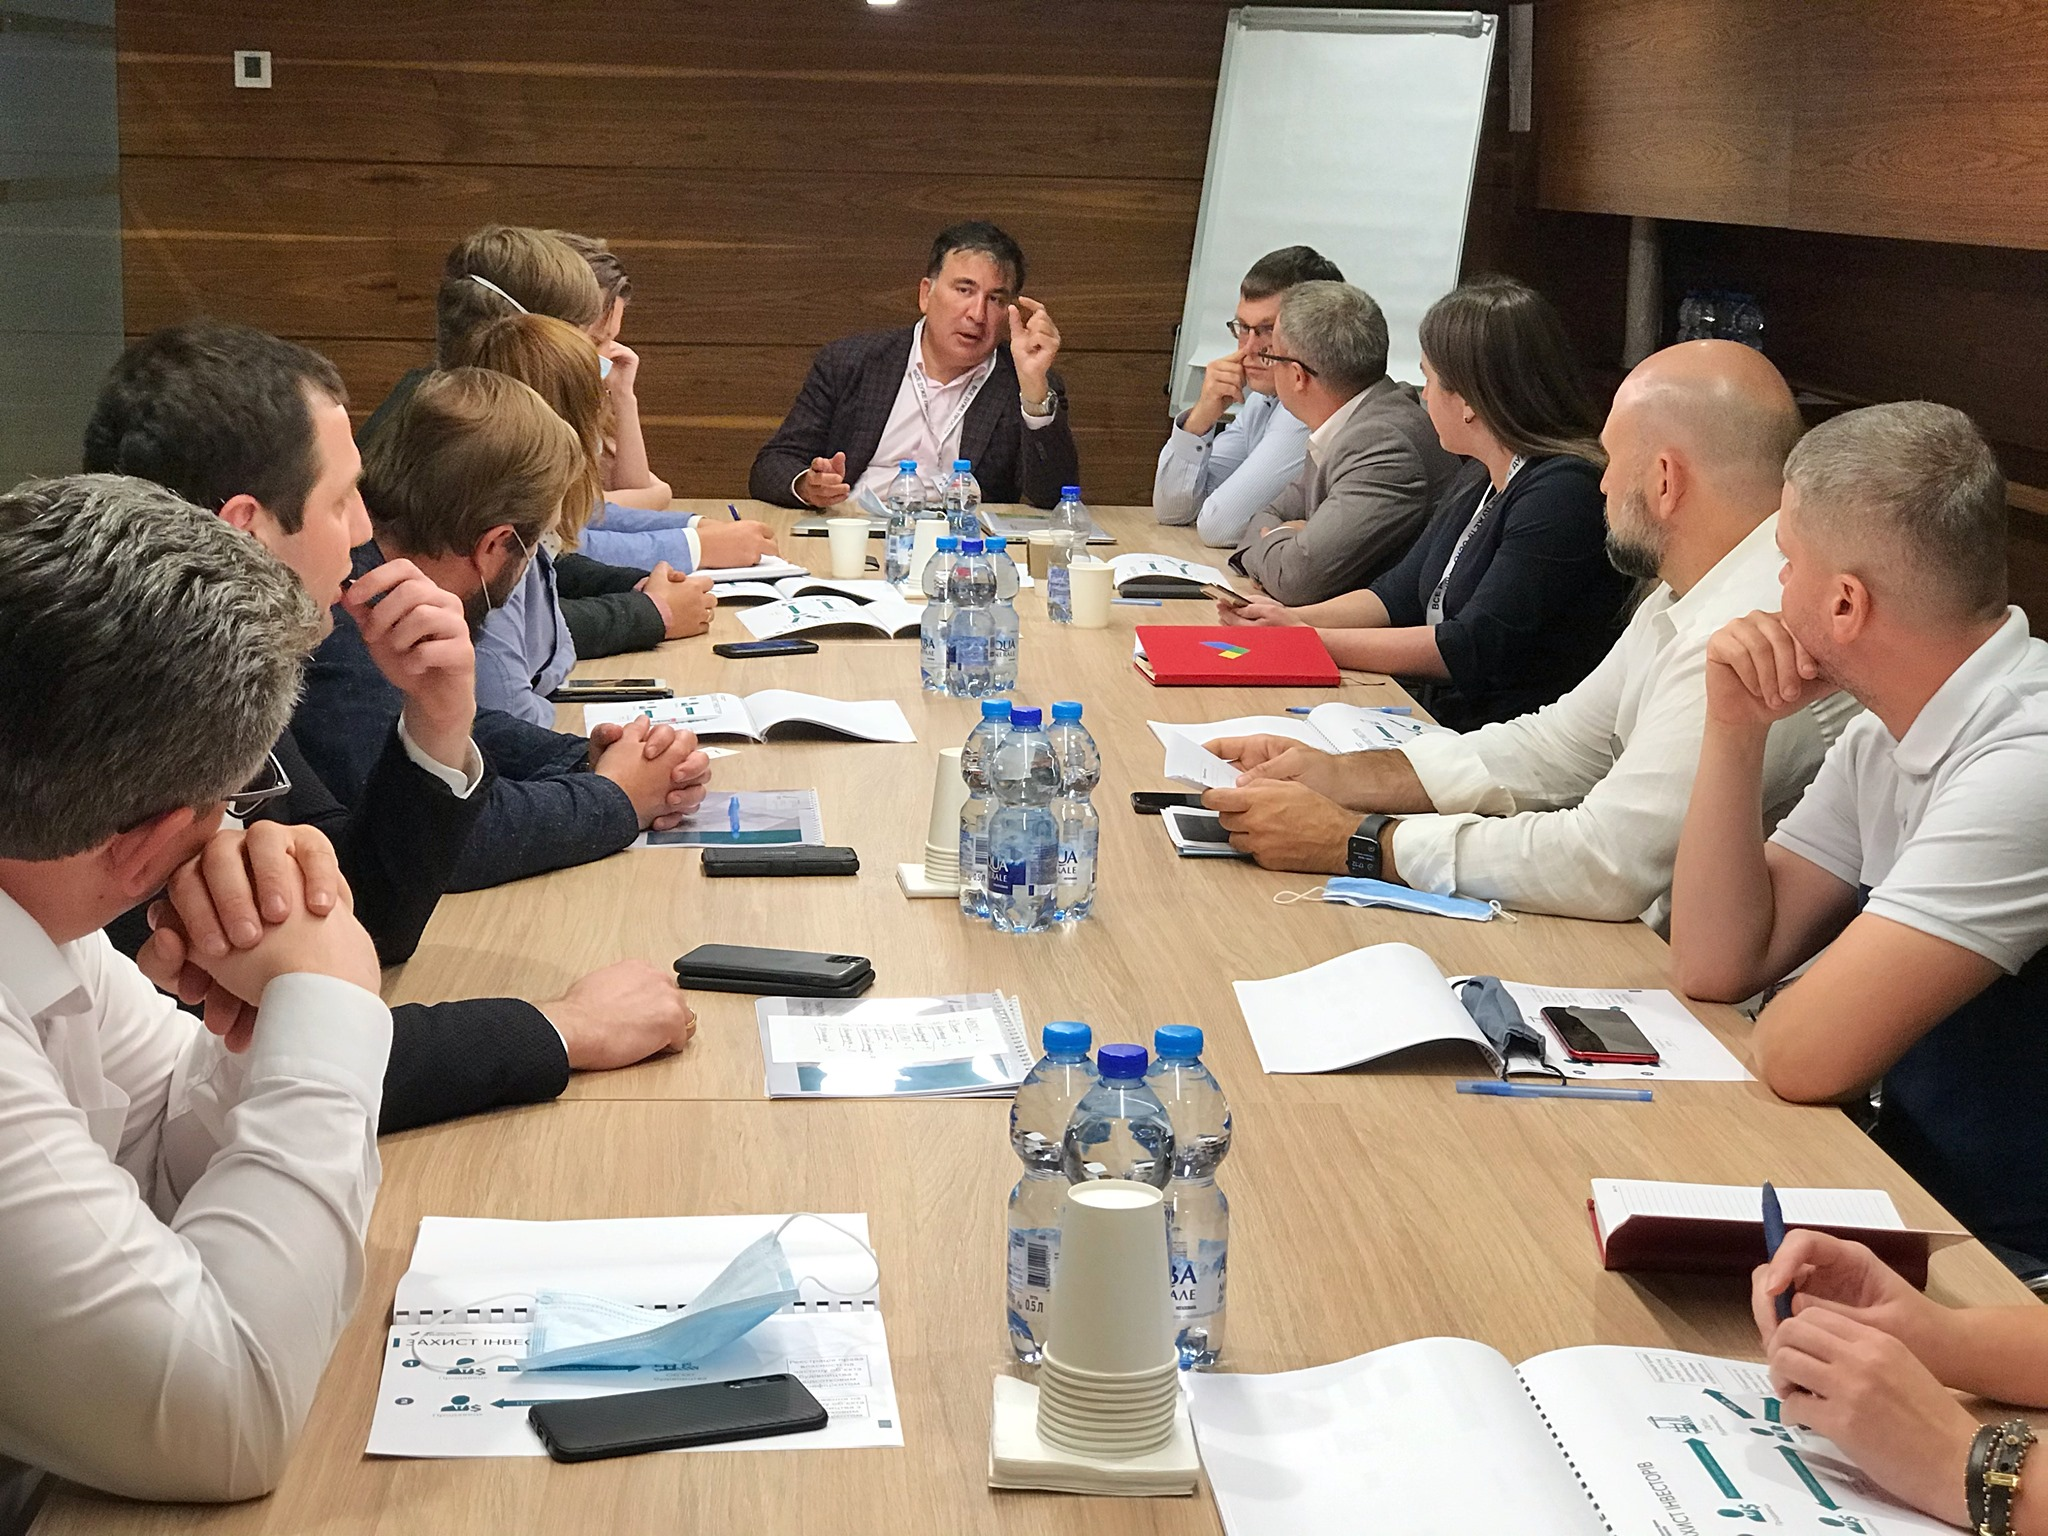 Михеил Саакашвили презентует реформу бизнес-ассоциациям и ассоциации застройщиков, фото: Михеил Саакашвили / Facebook